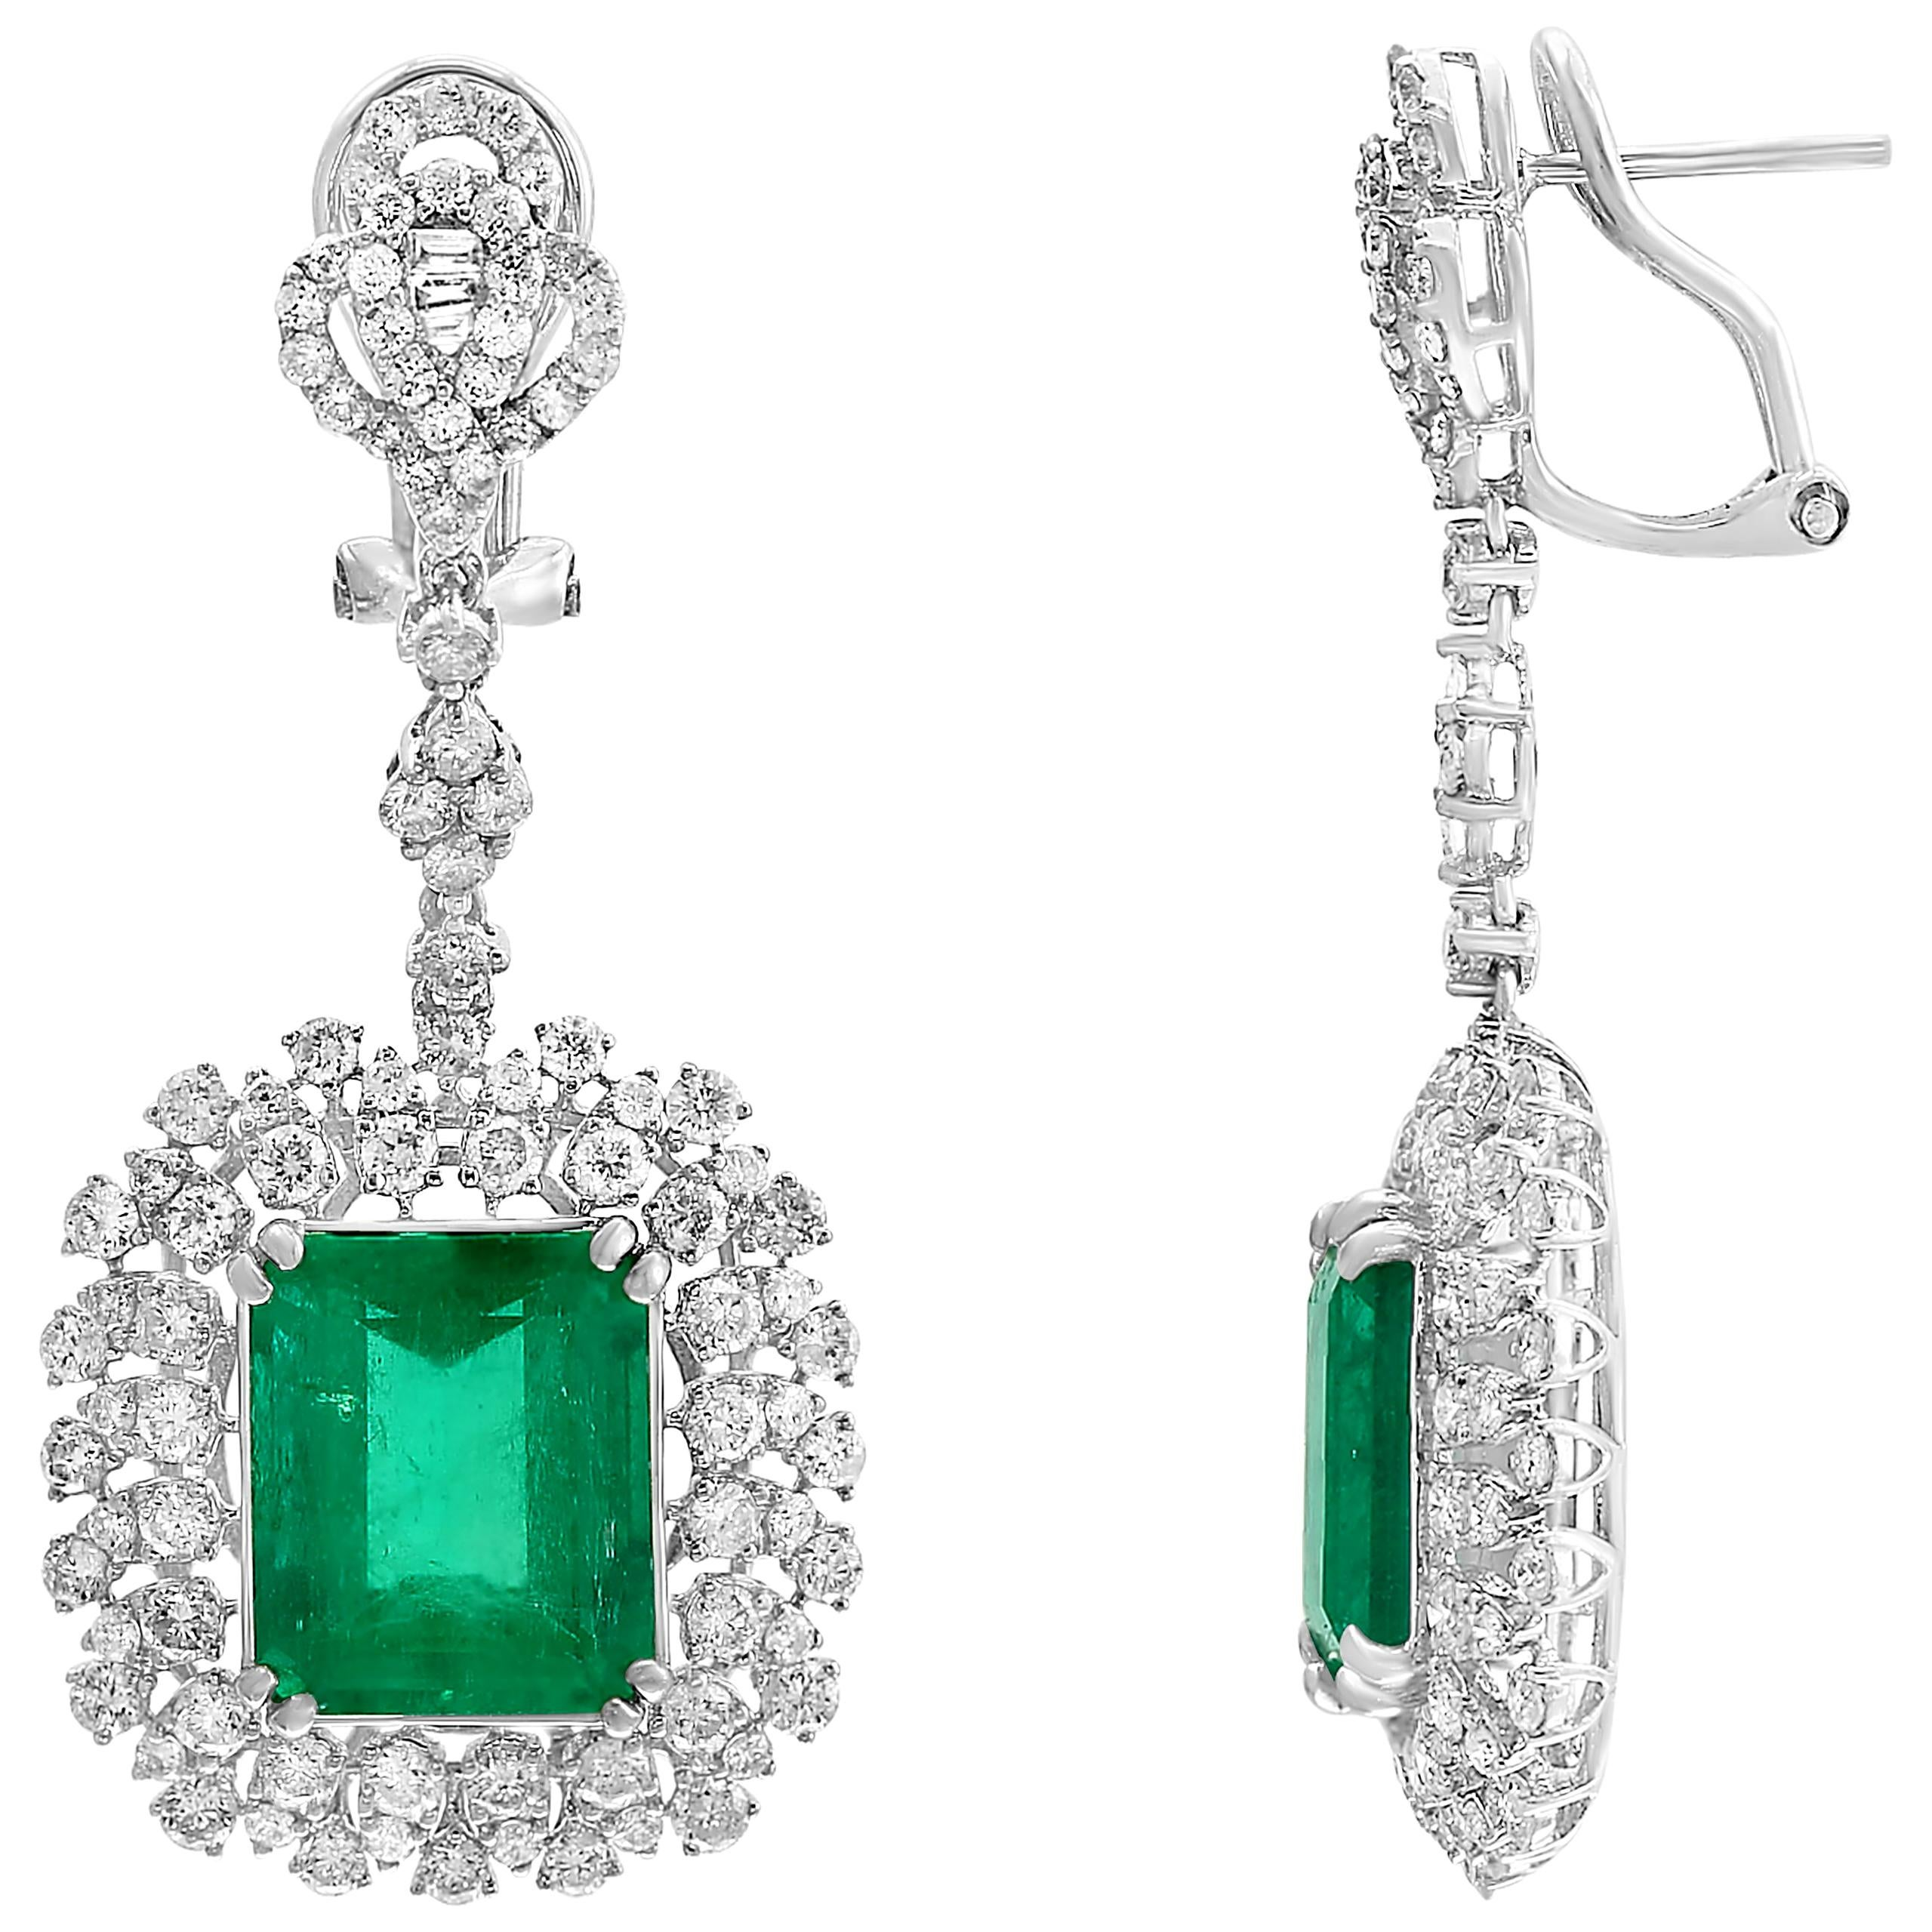 10 Carat Colombian Emerald Cut Emerald Diamond  Hanging /Drop Earrings 18Kt Gold